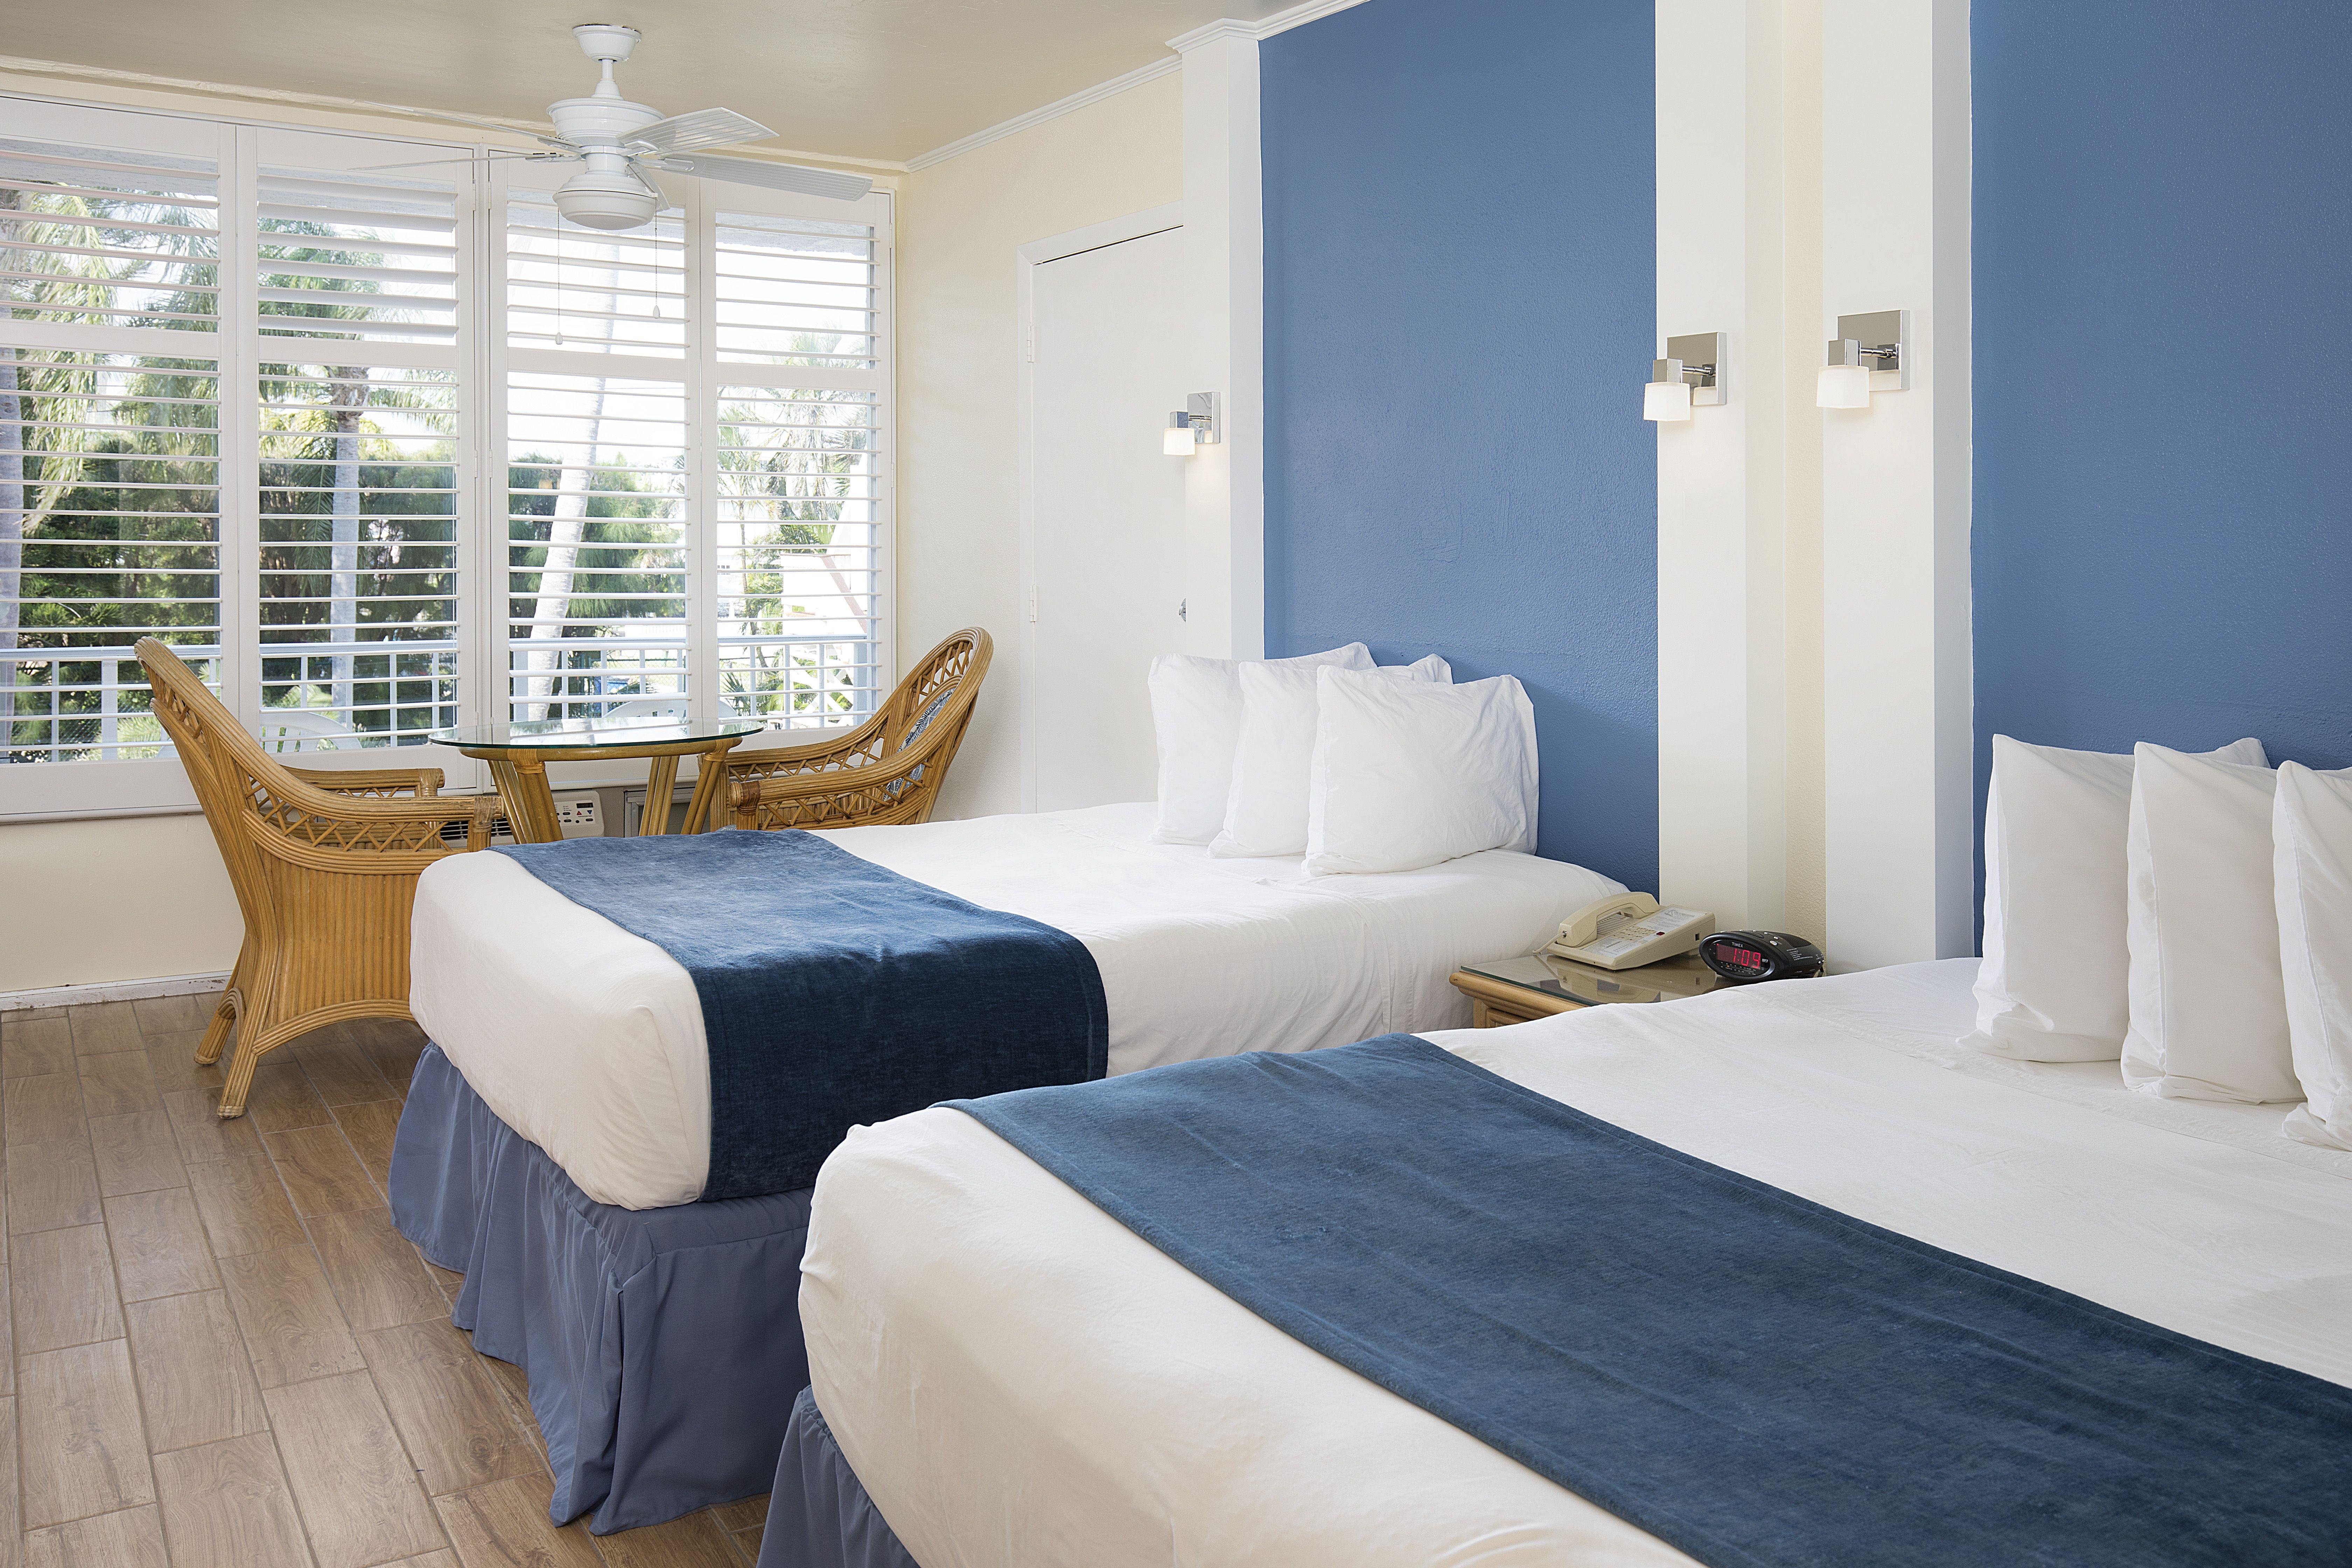 Guest Room At #Fortmyersbeachs Favorite Resort, The Outrigger Beach Resort